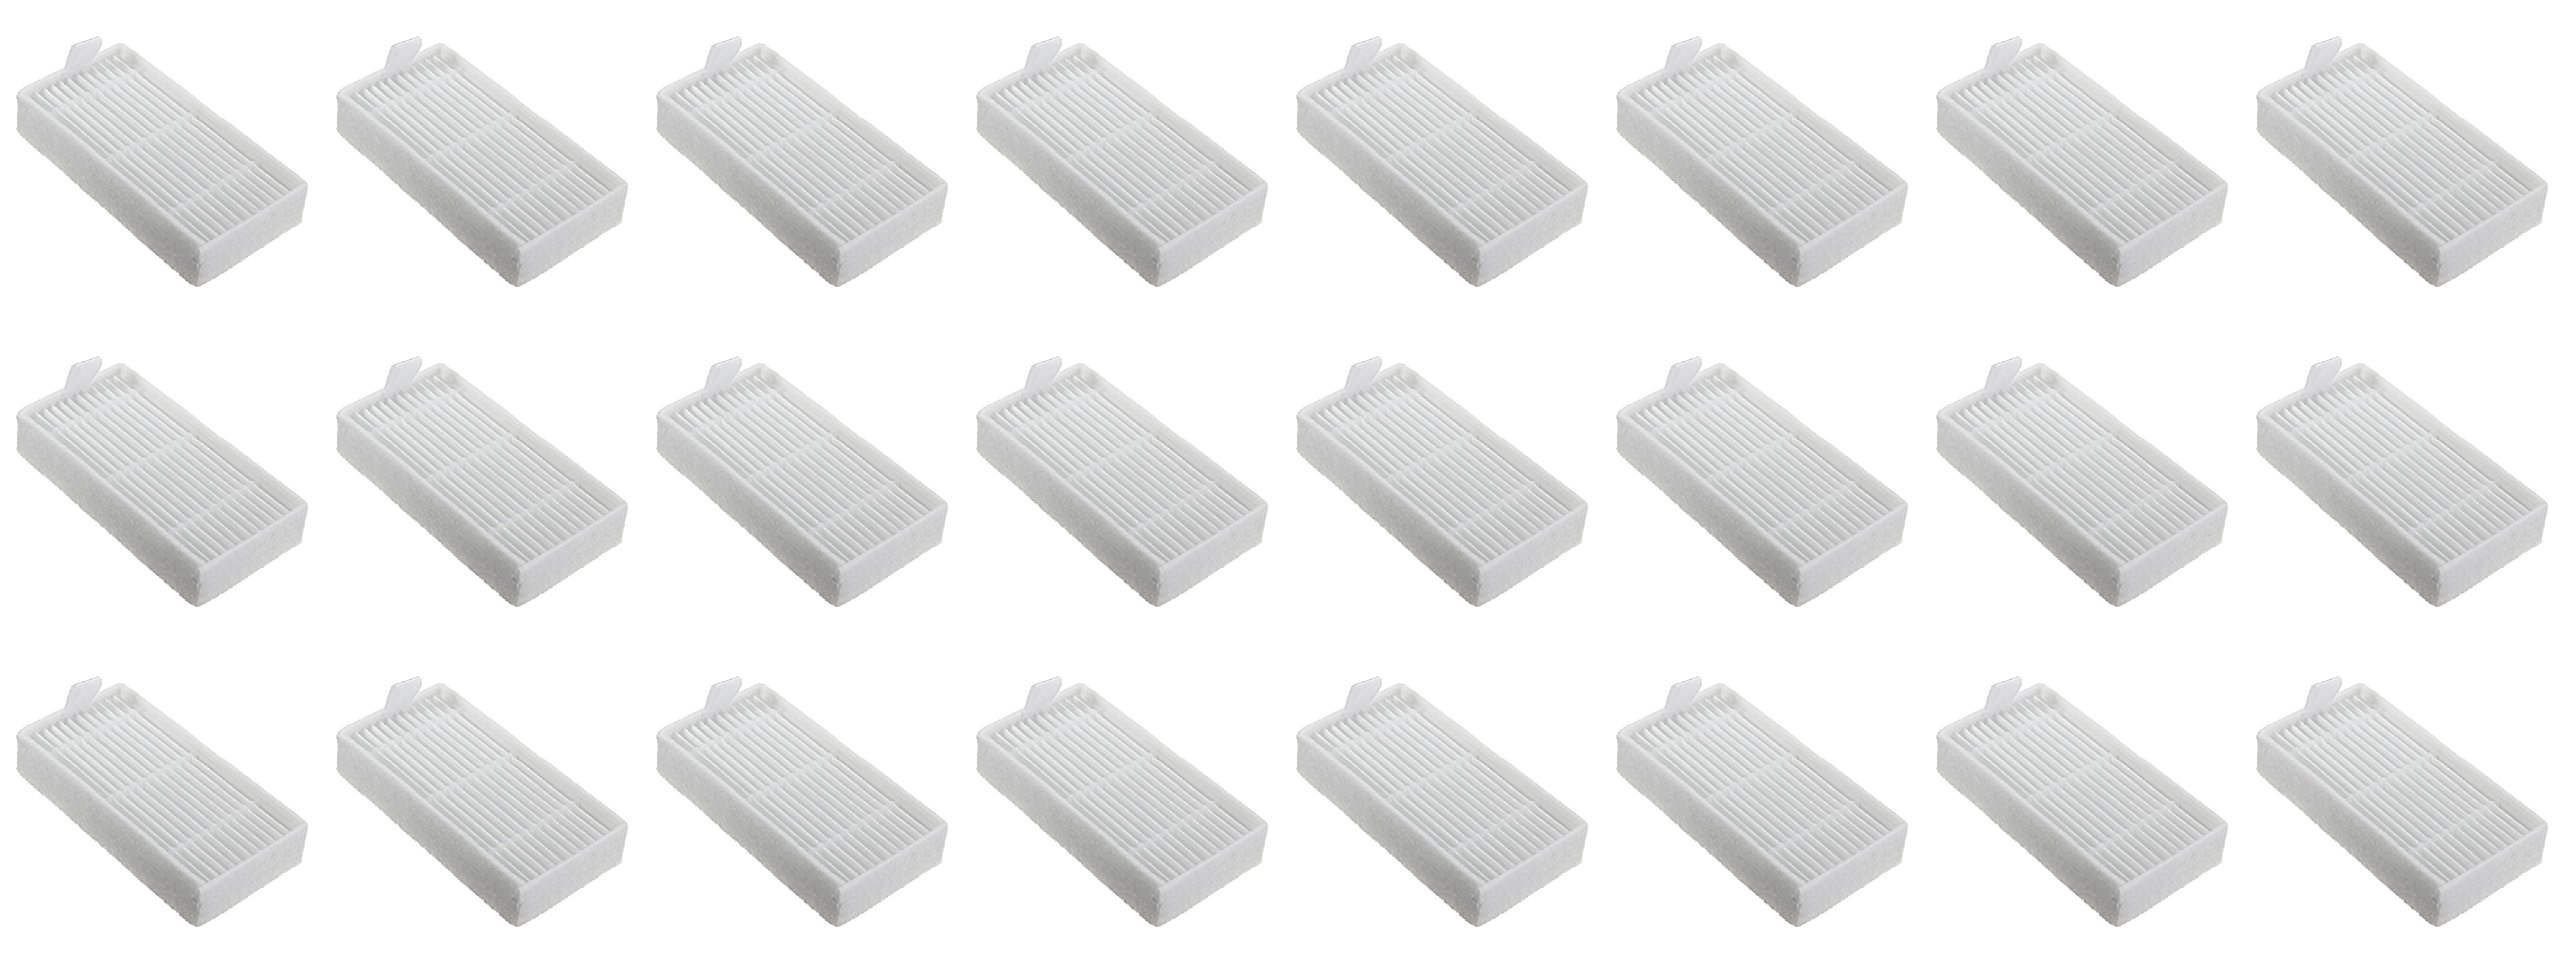 Nispira HEPA Filter Compatible Ilife Model V3s V3s pro, V5, and V5s V5s Pro Robotic Vacuum Cleaner, 24 Packs